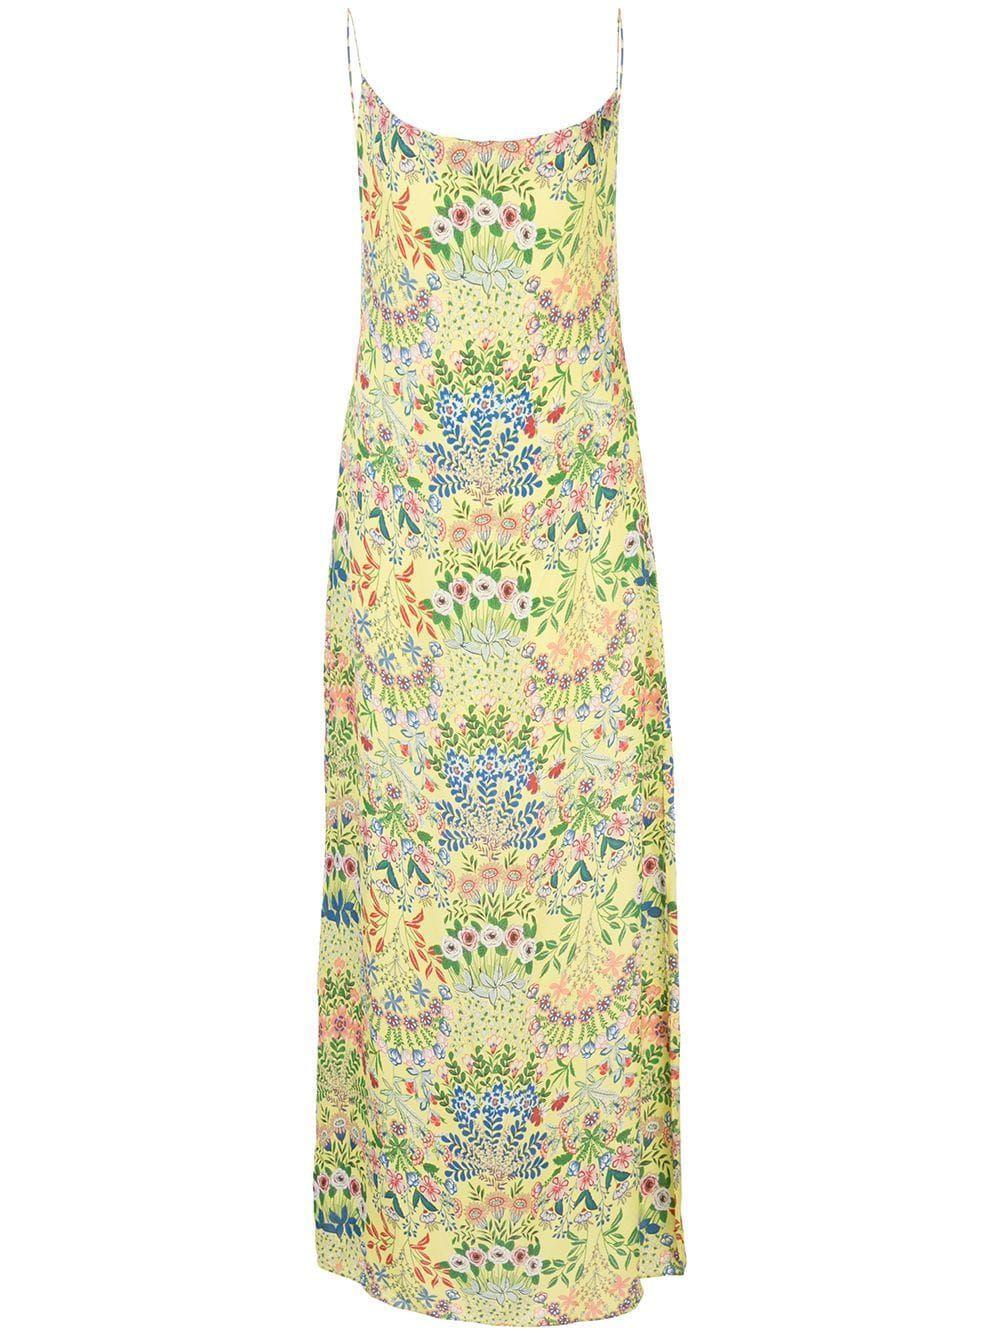 Harmony Maxi Dress With Slit Item # CC003P19508